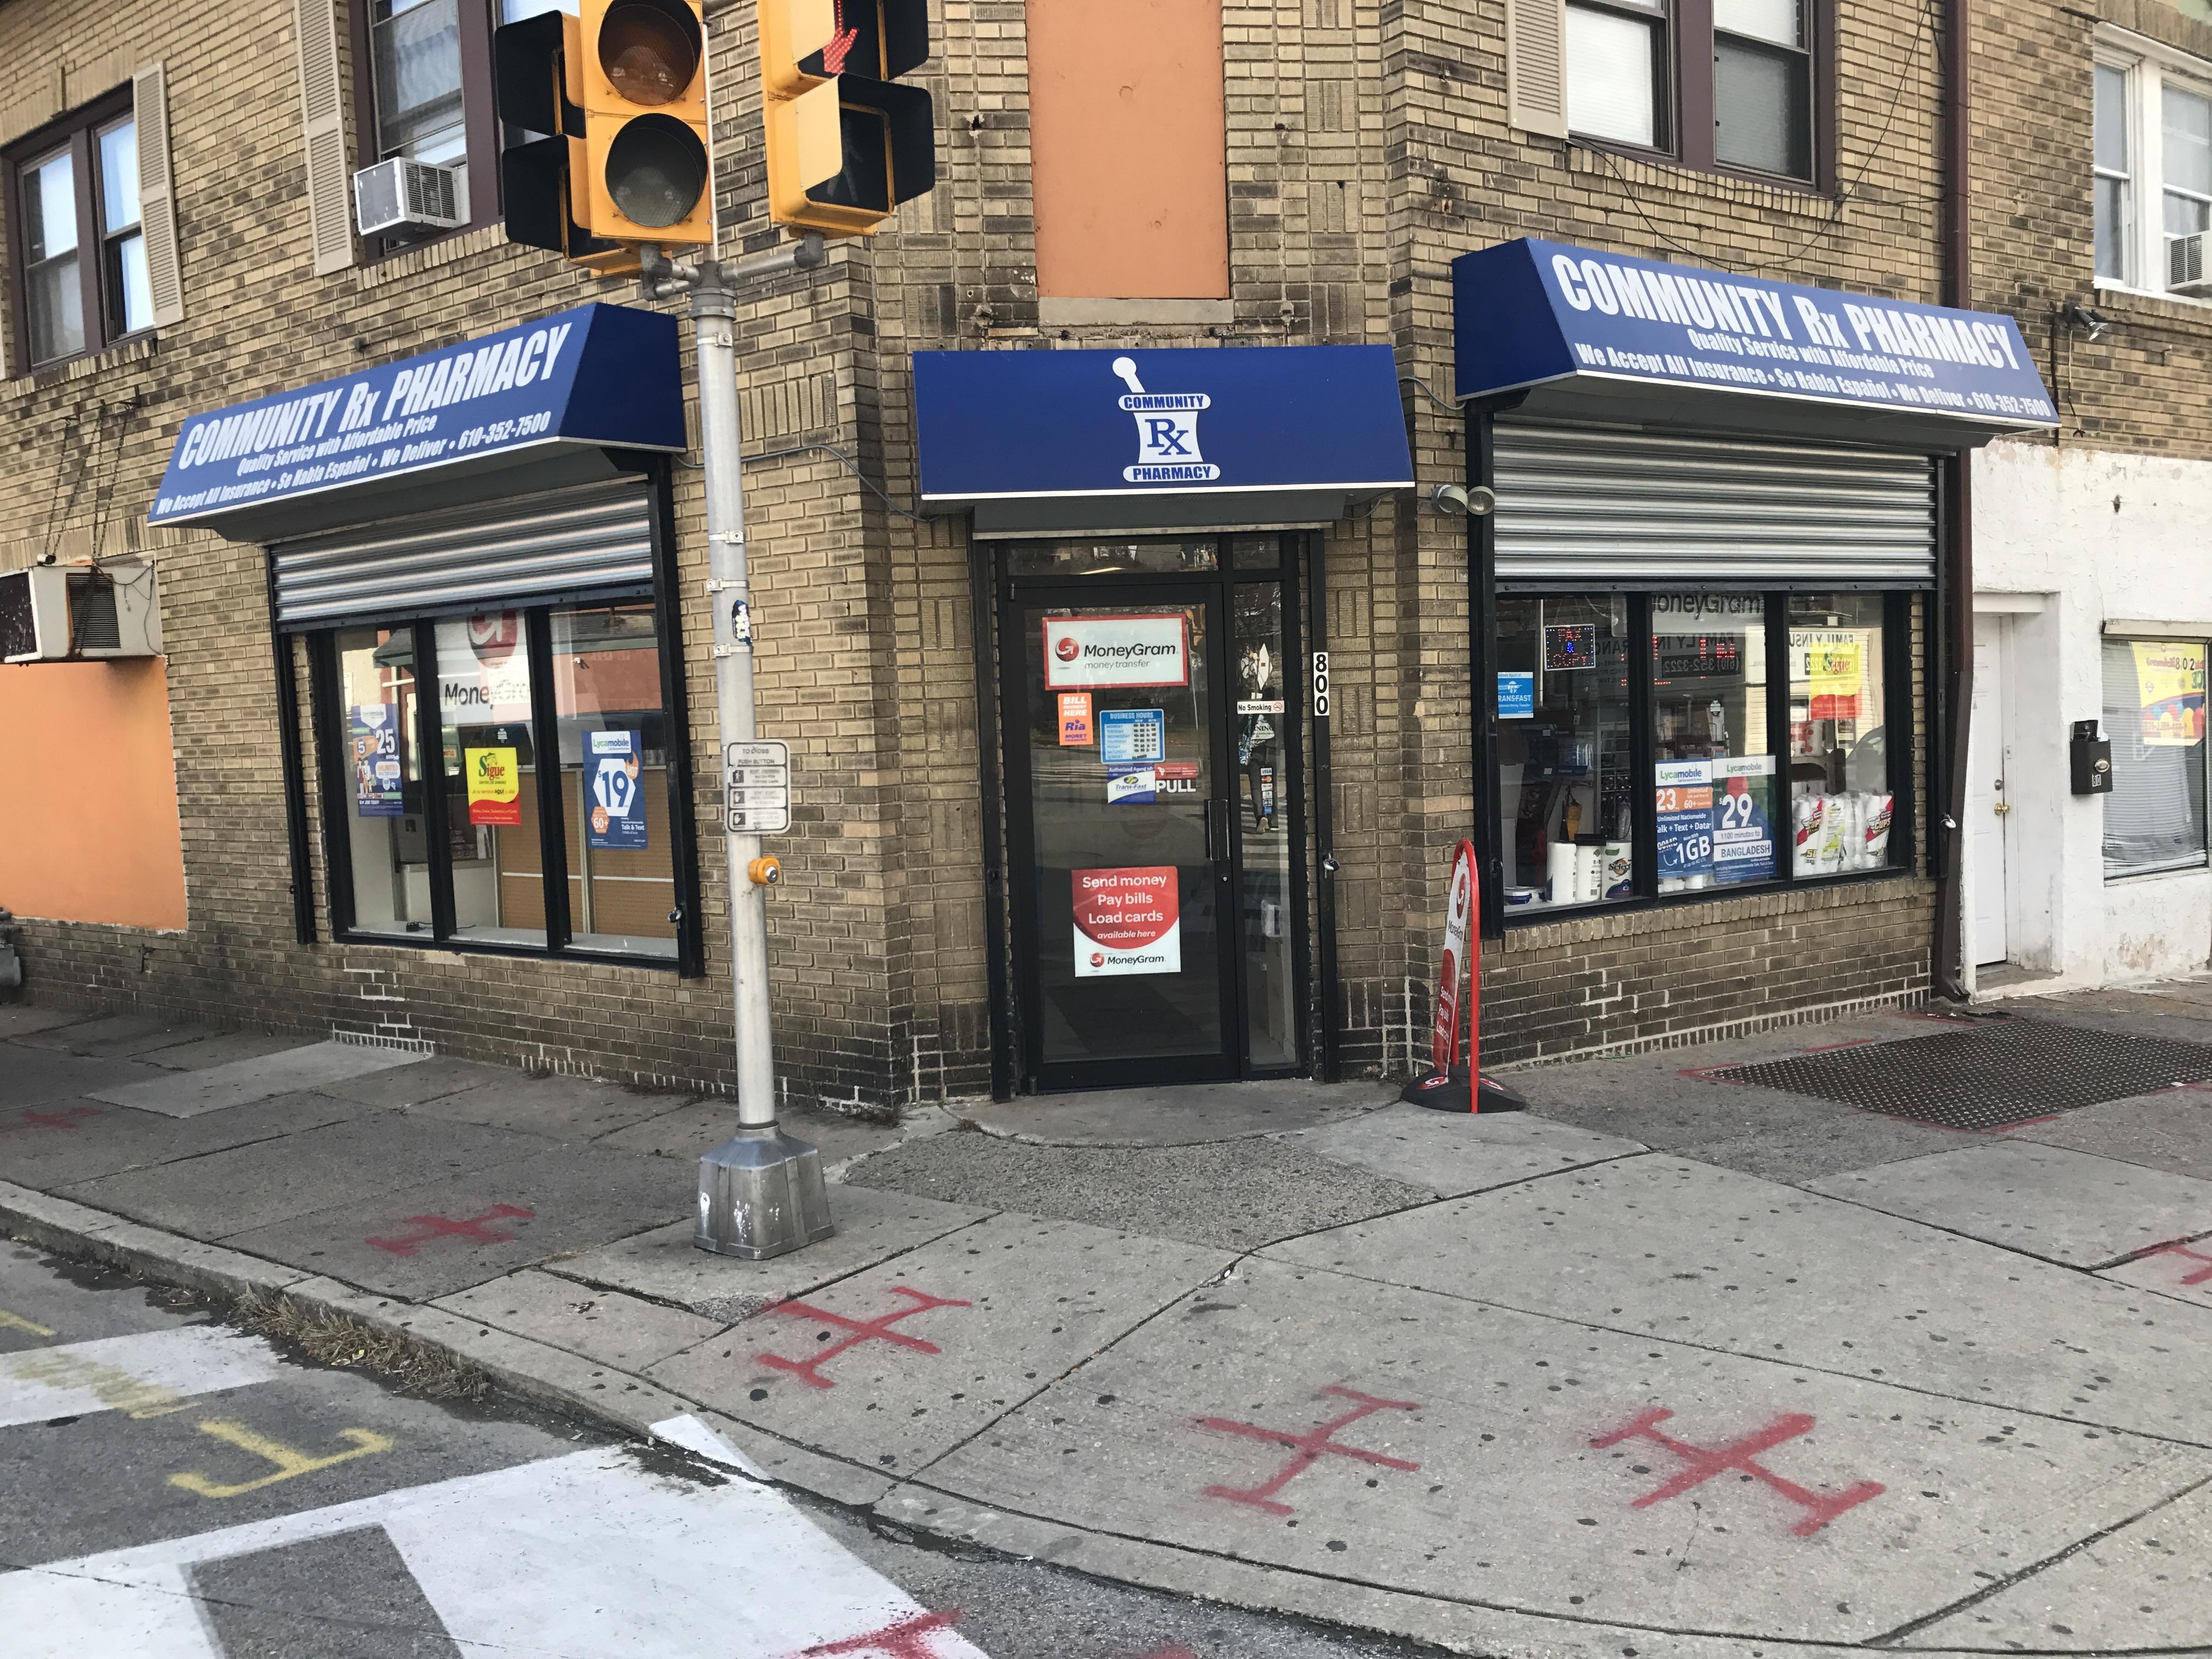 Community RX Pharmacy